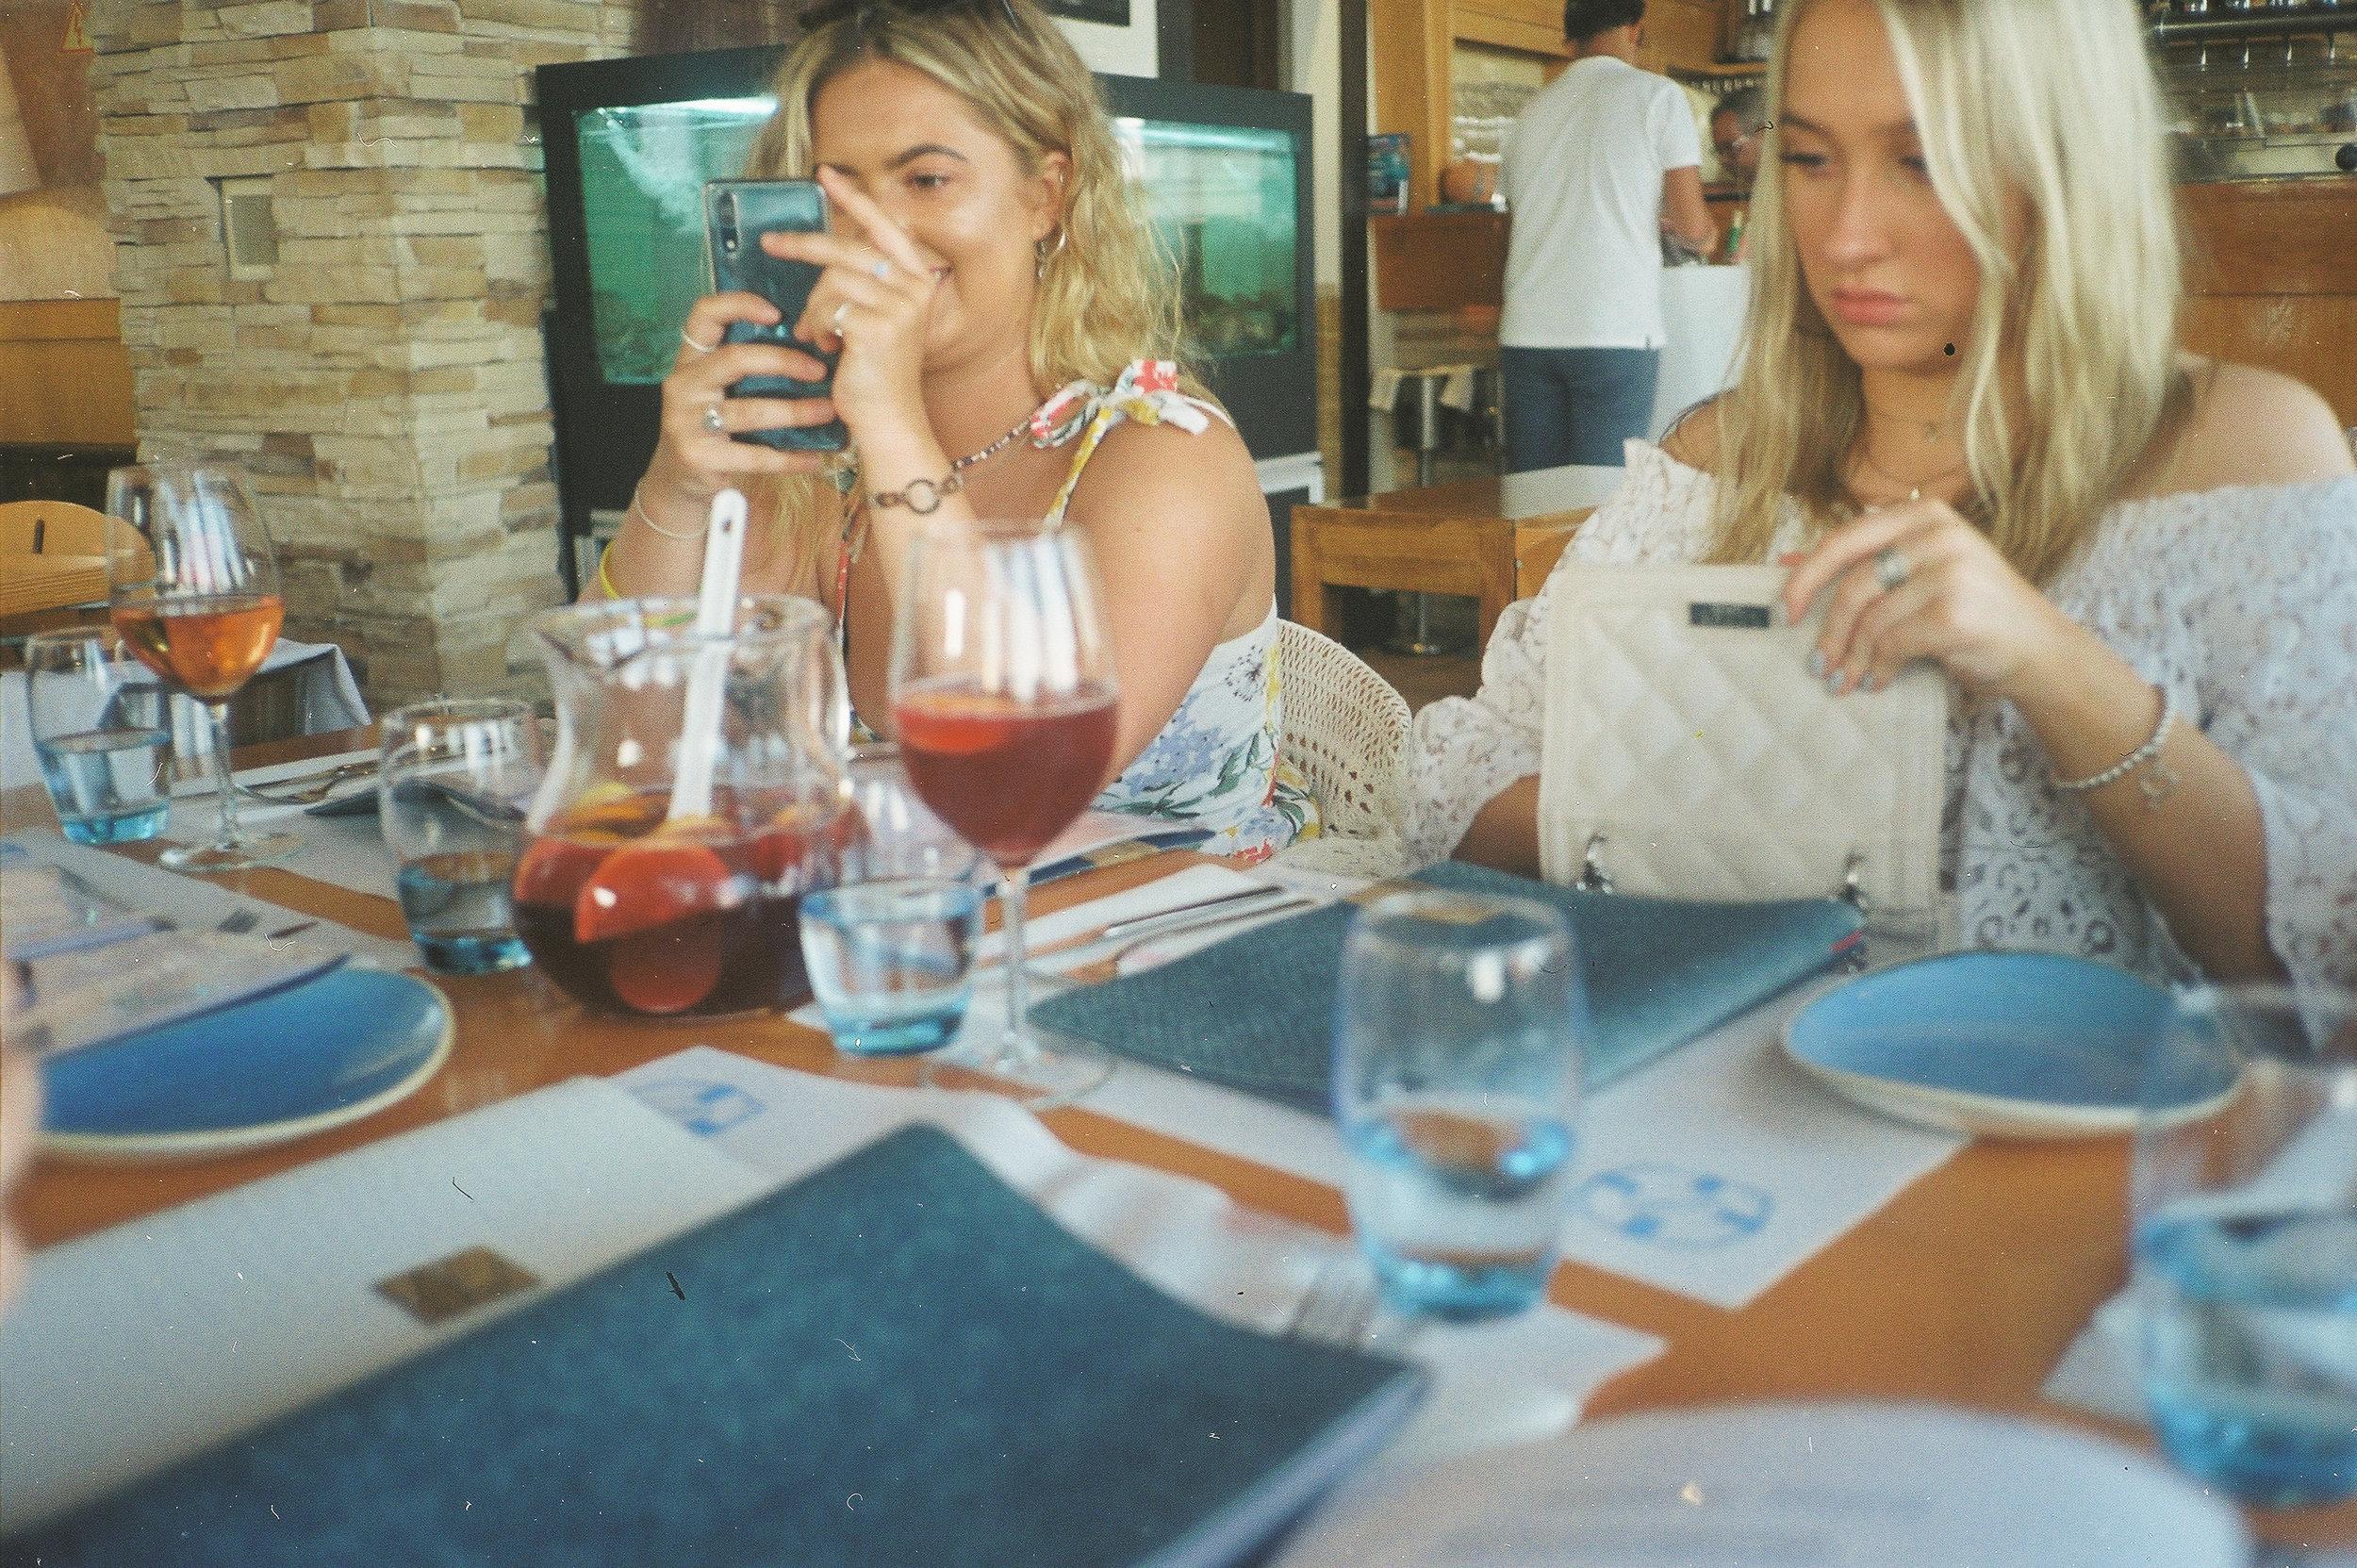 a-girls-trip-to-portugal-on-35mm-film58.jpg